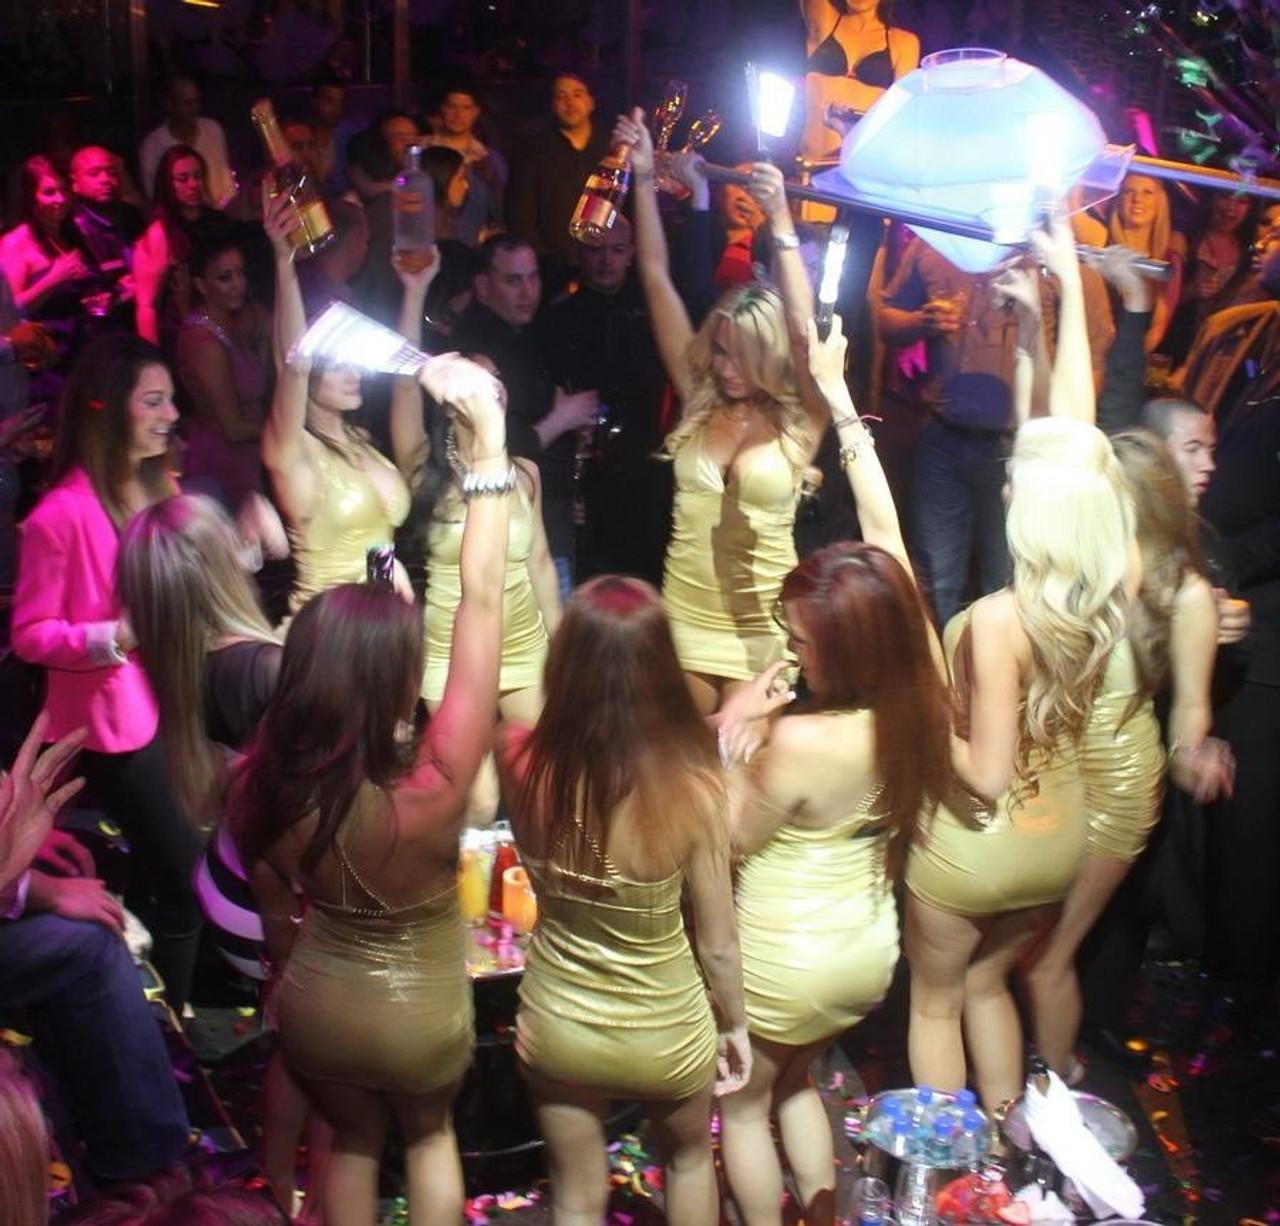 Handheld strobe, hand strobe, Flash baton, Electronic bottle service, LED Baton, Strobe baton, baton led, Nightclub baton, Bottle Sparklers, VIP SParklers, Bottle service sparklers, VIP LED BATON, LED WAND,  Strobe wand, Champagne Bottle Sparklers, LED NIGHTCLUB BATON, LED NIGHTCLUB WAND